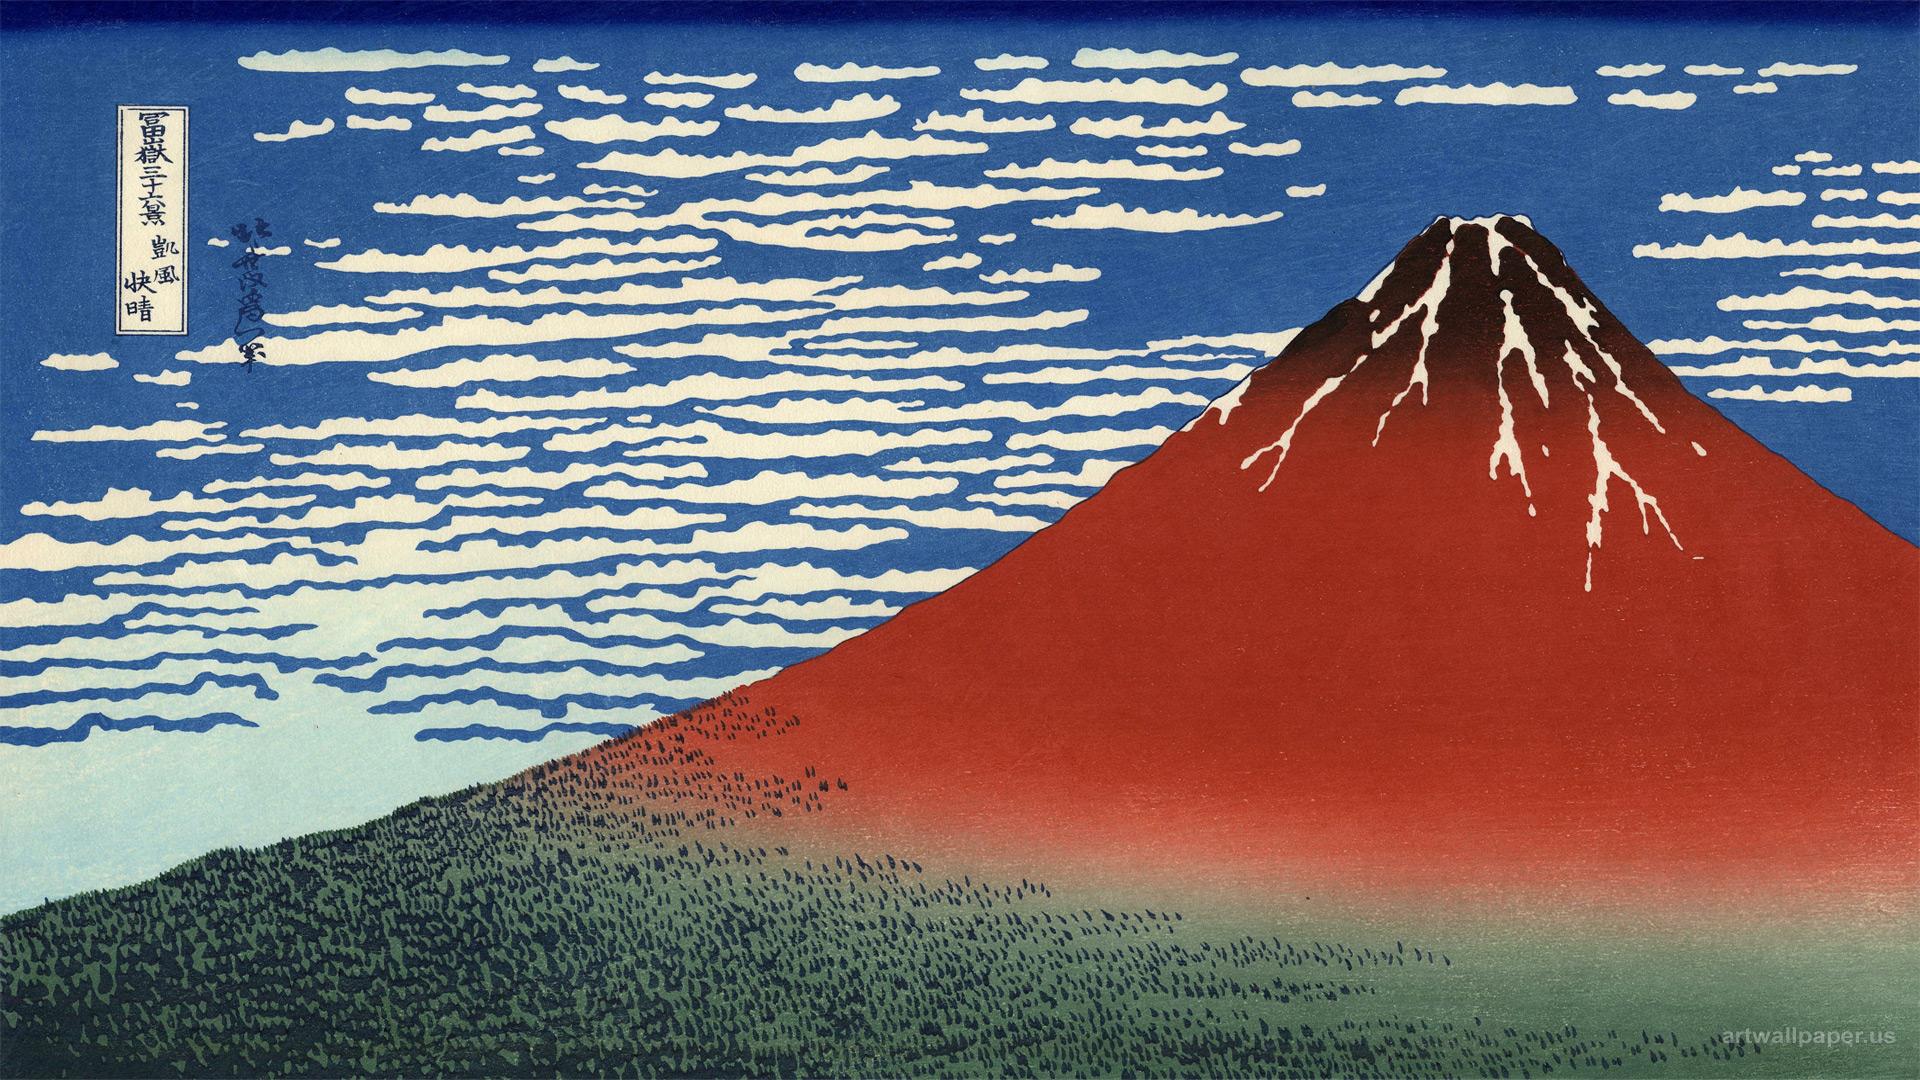 Japan Art Wallpaper Hd